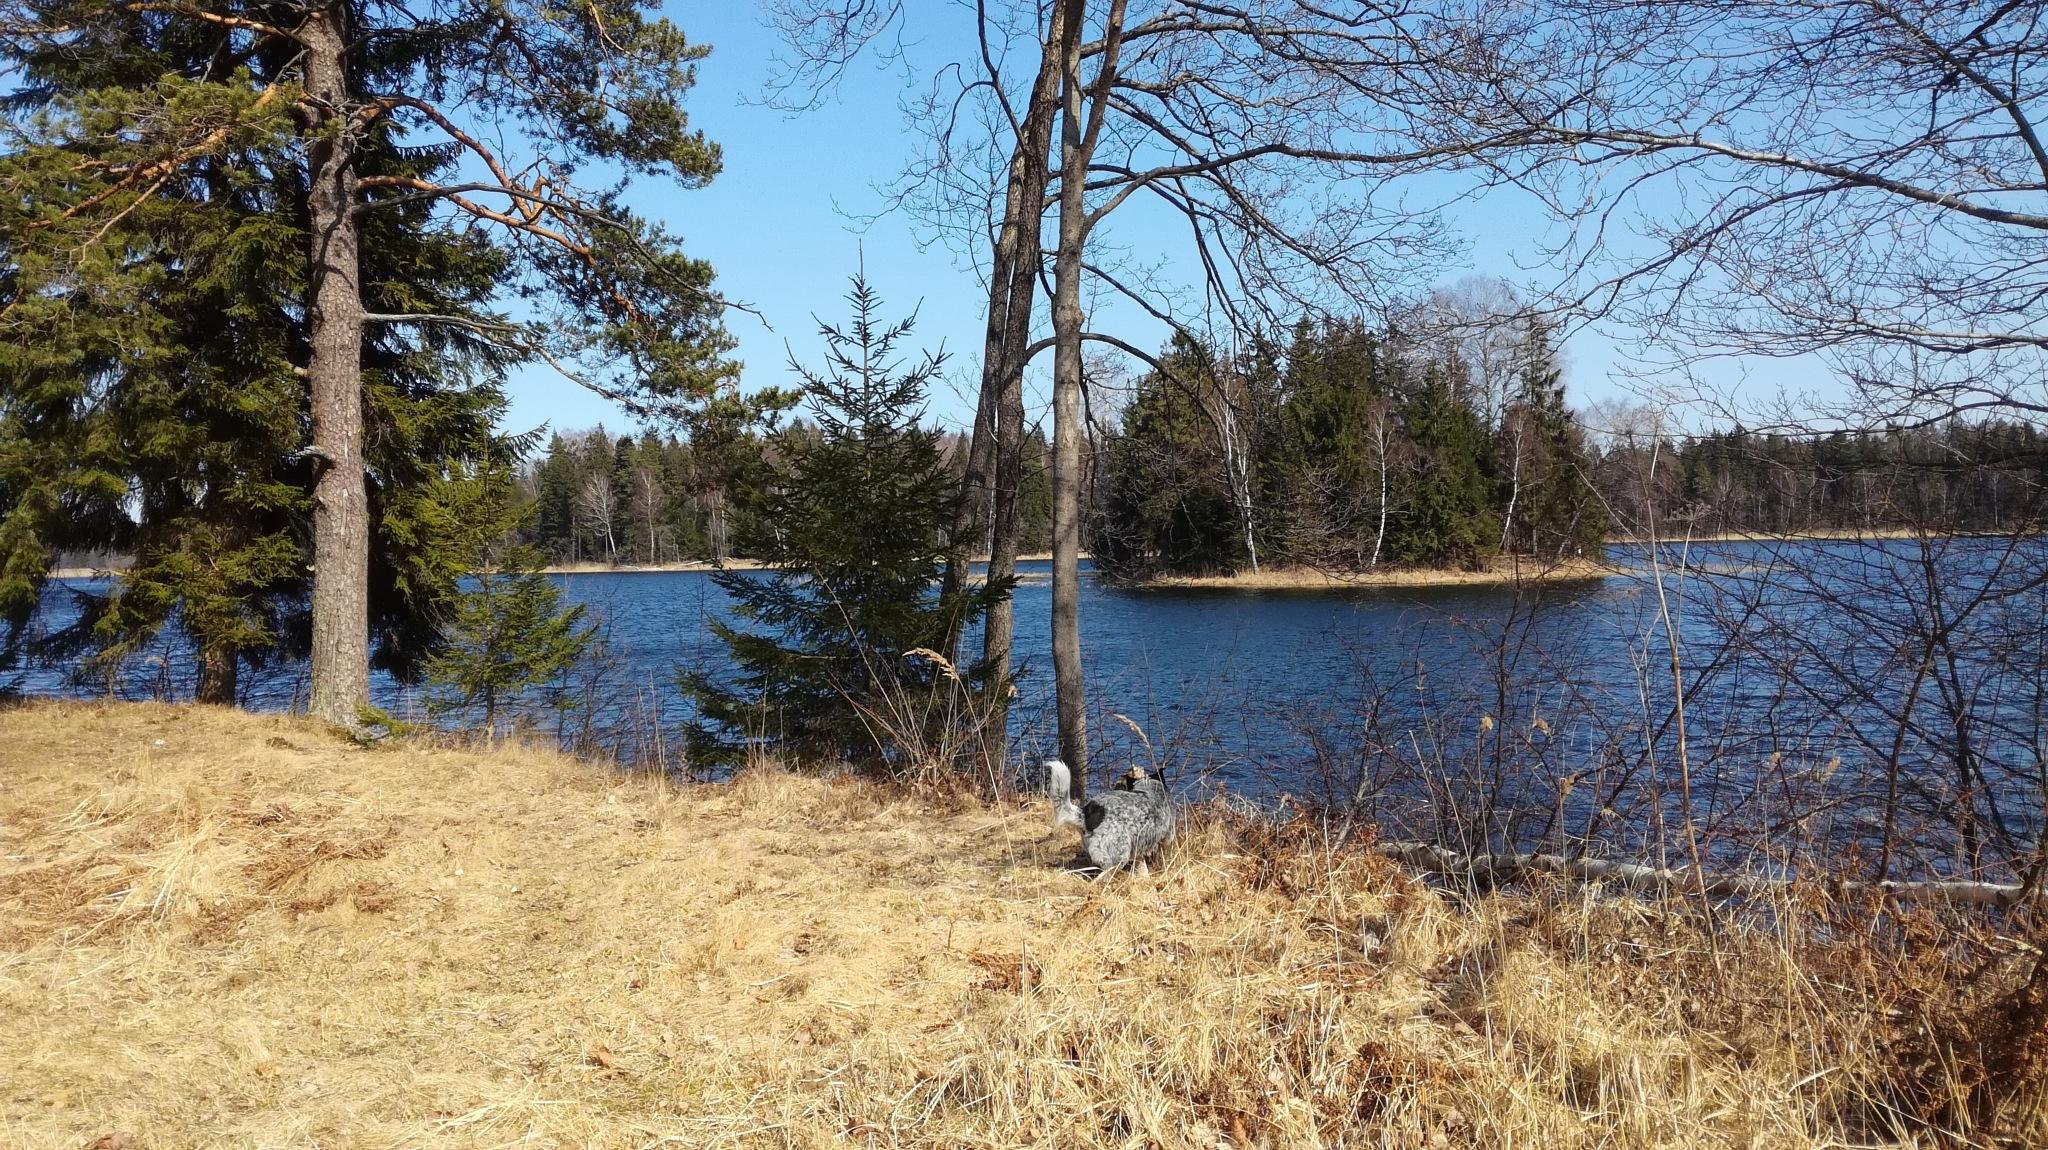 Lake Plateliai by uzkuraitiene62